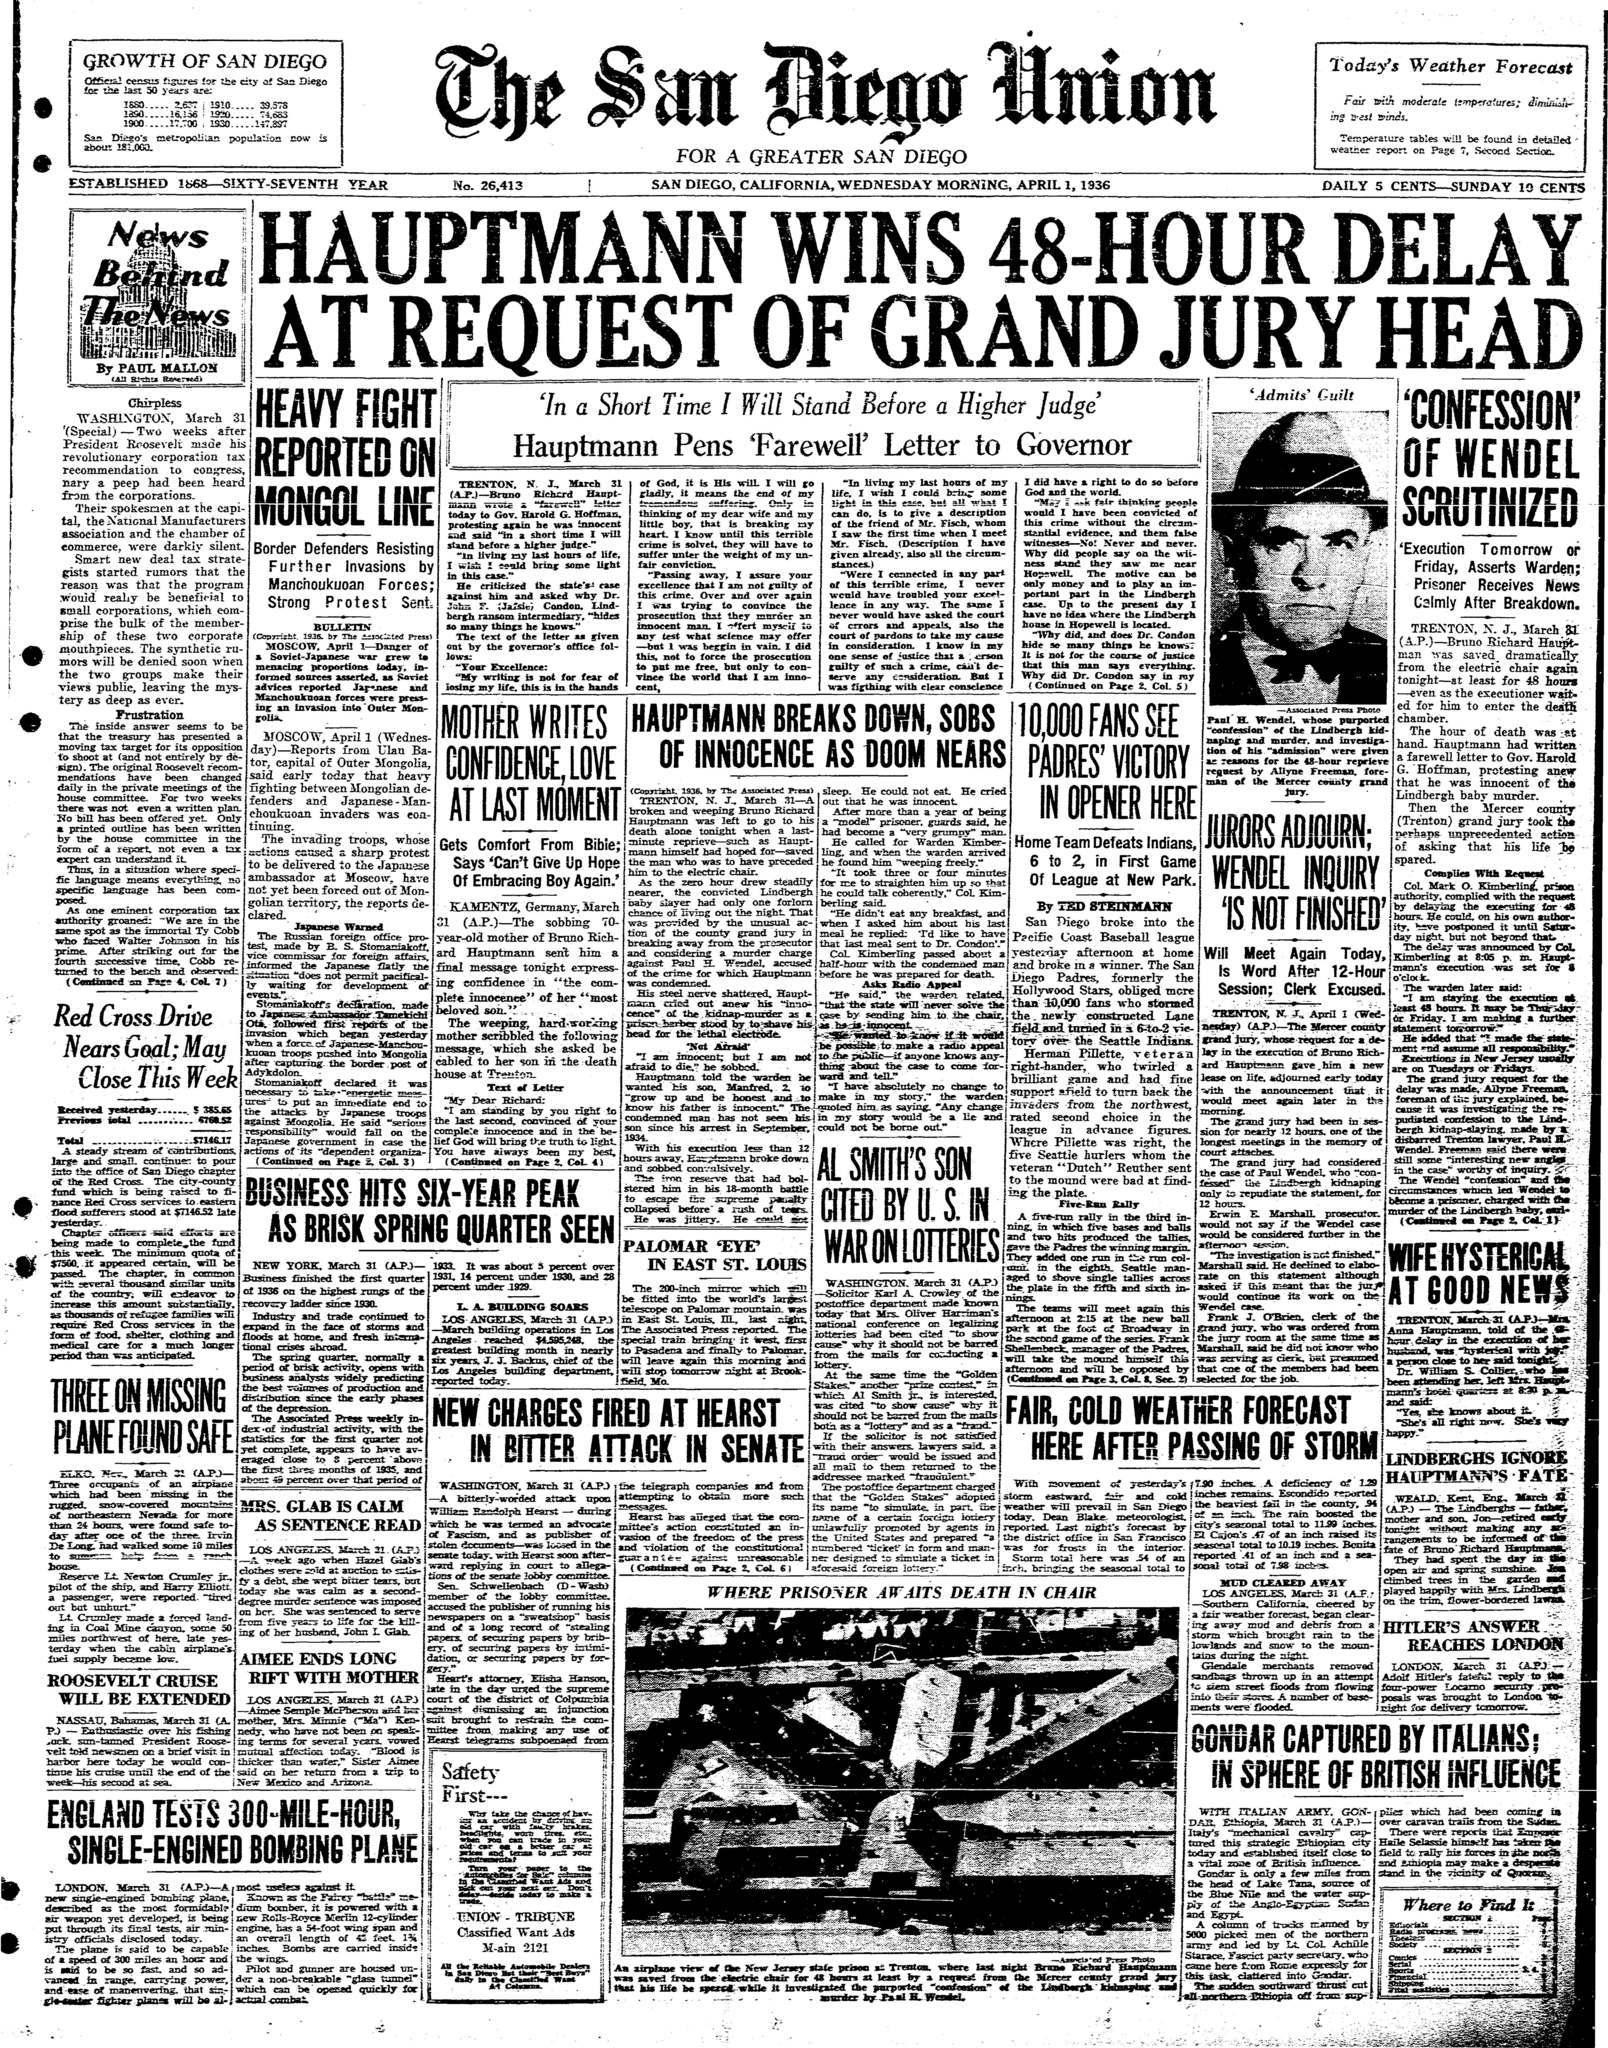 April 1, 1936